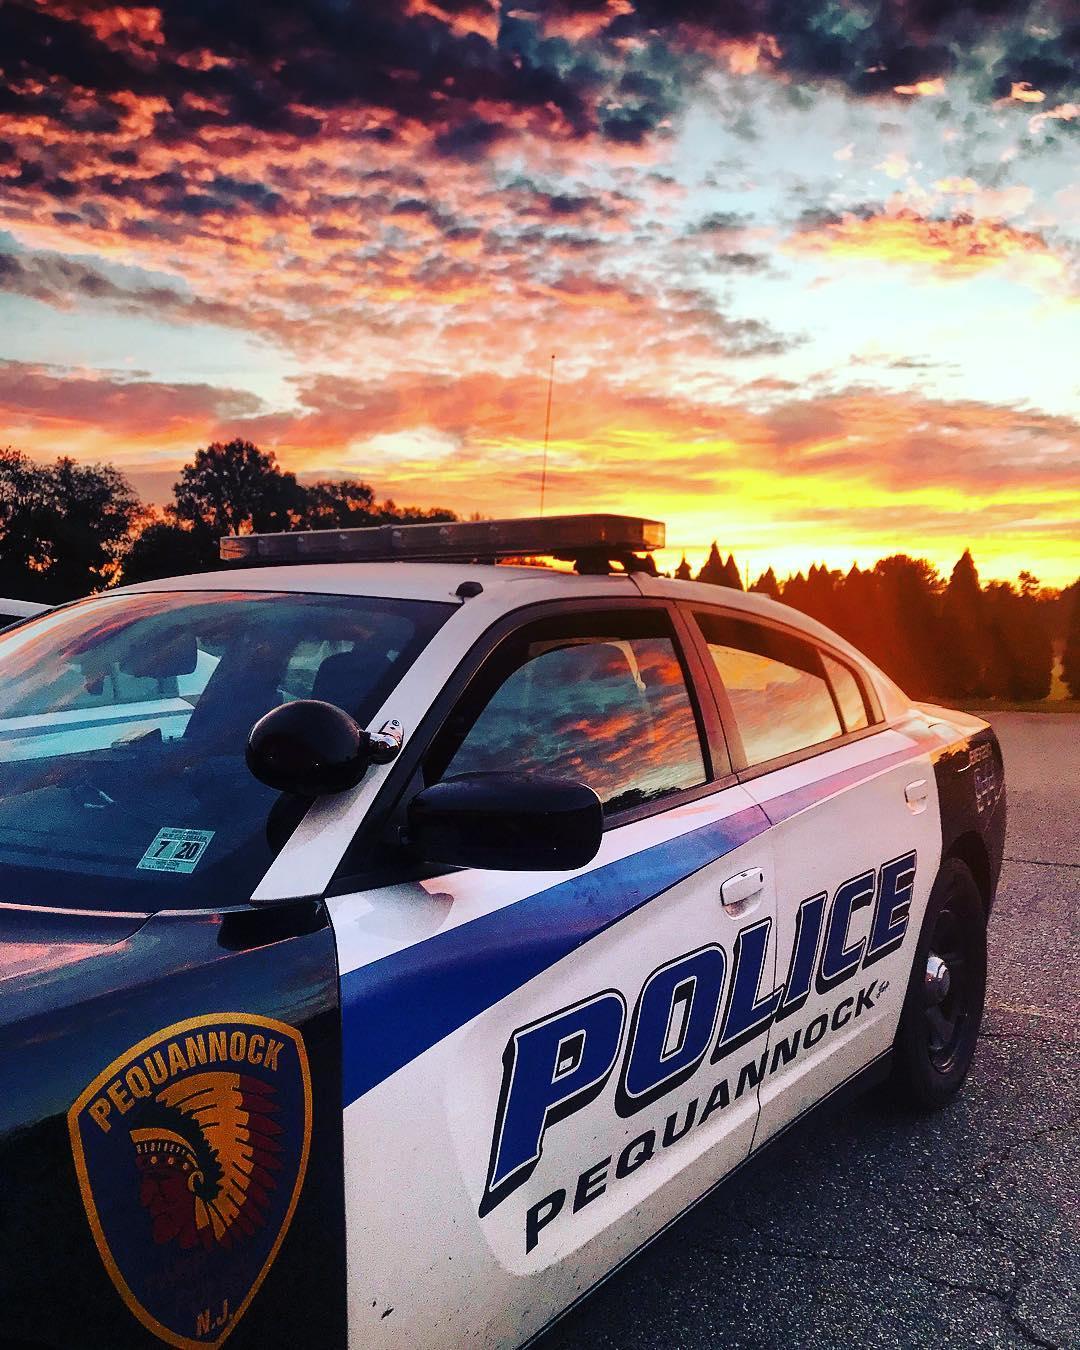 Pequannock Police - PBA Local 172 Police Car